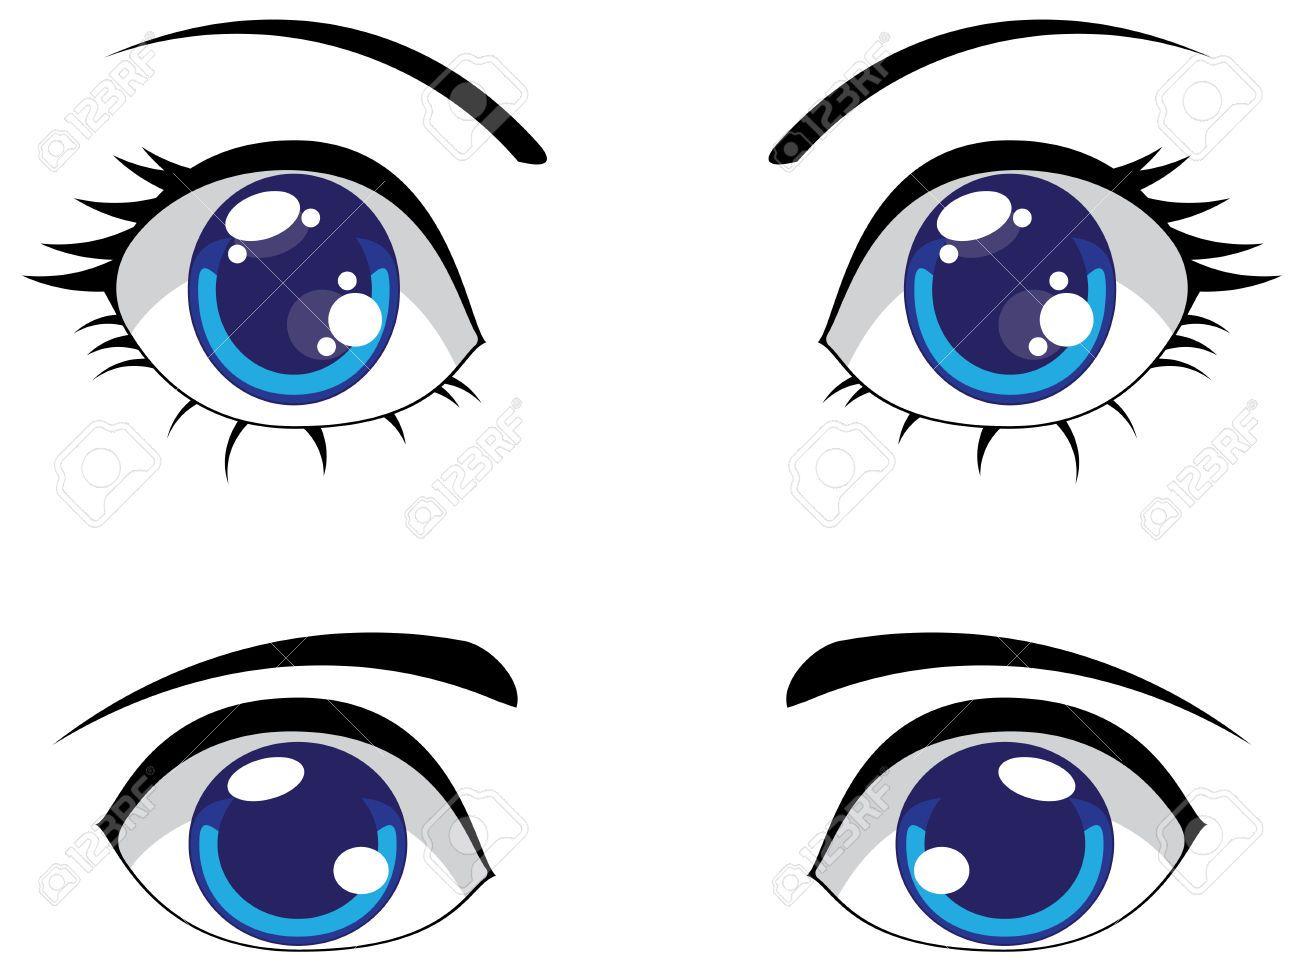 Stock vector yarn tales. Eyeballs clipart male eye